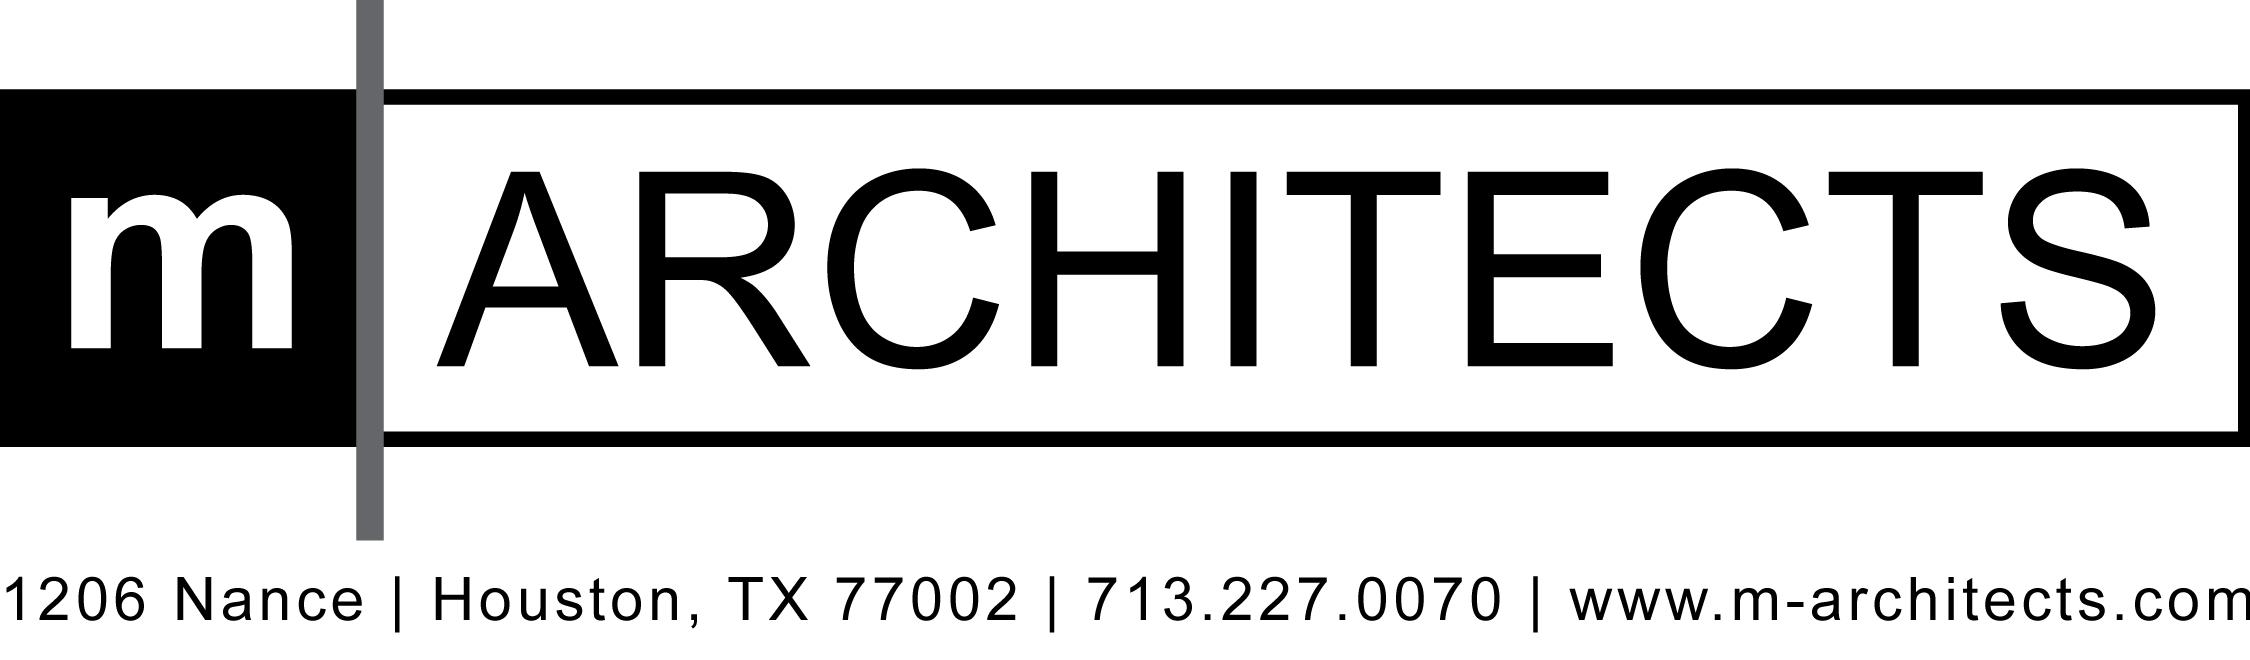 MArchitects